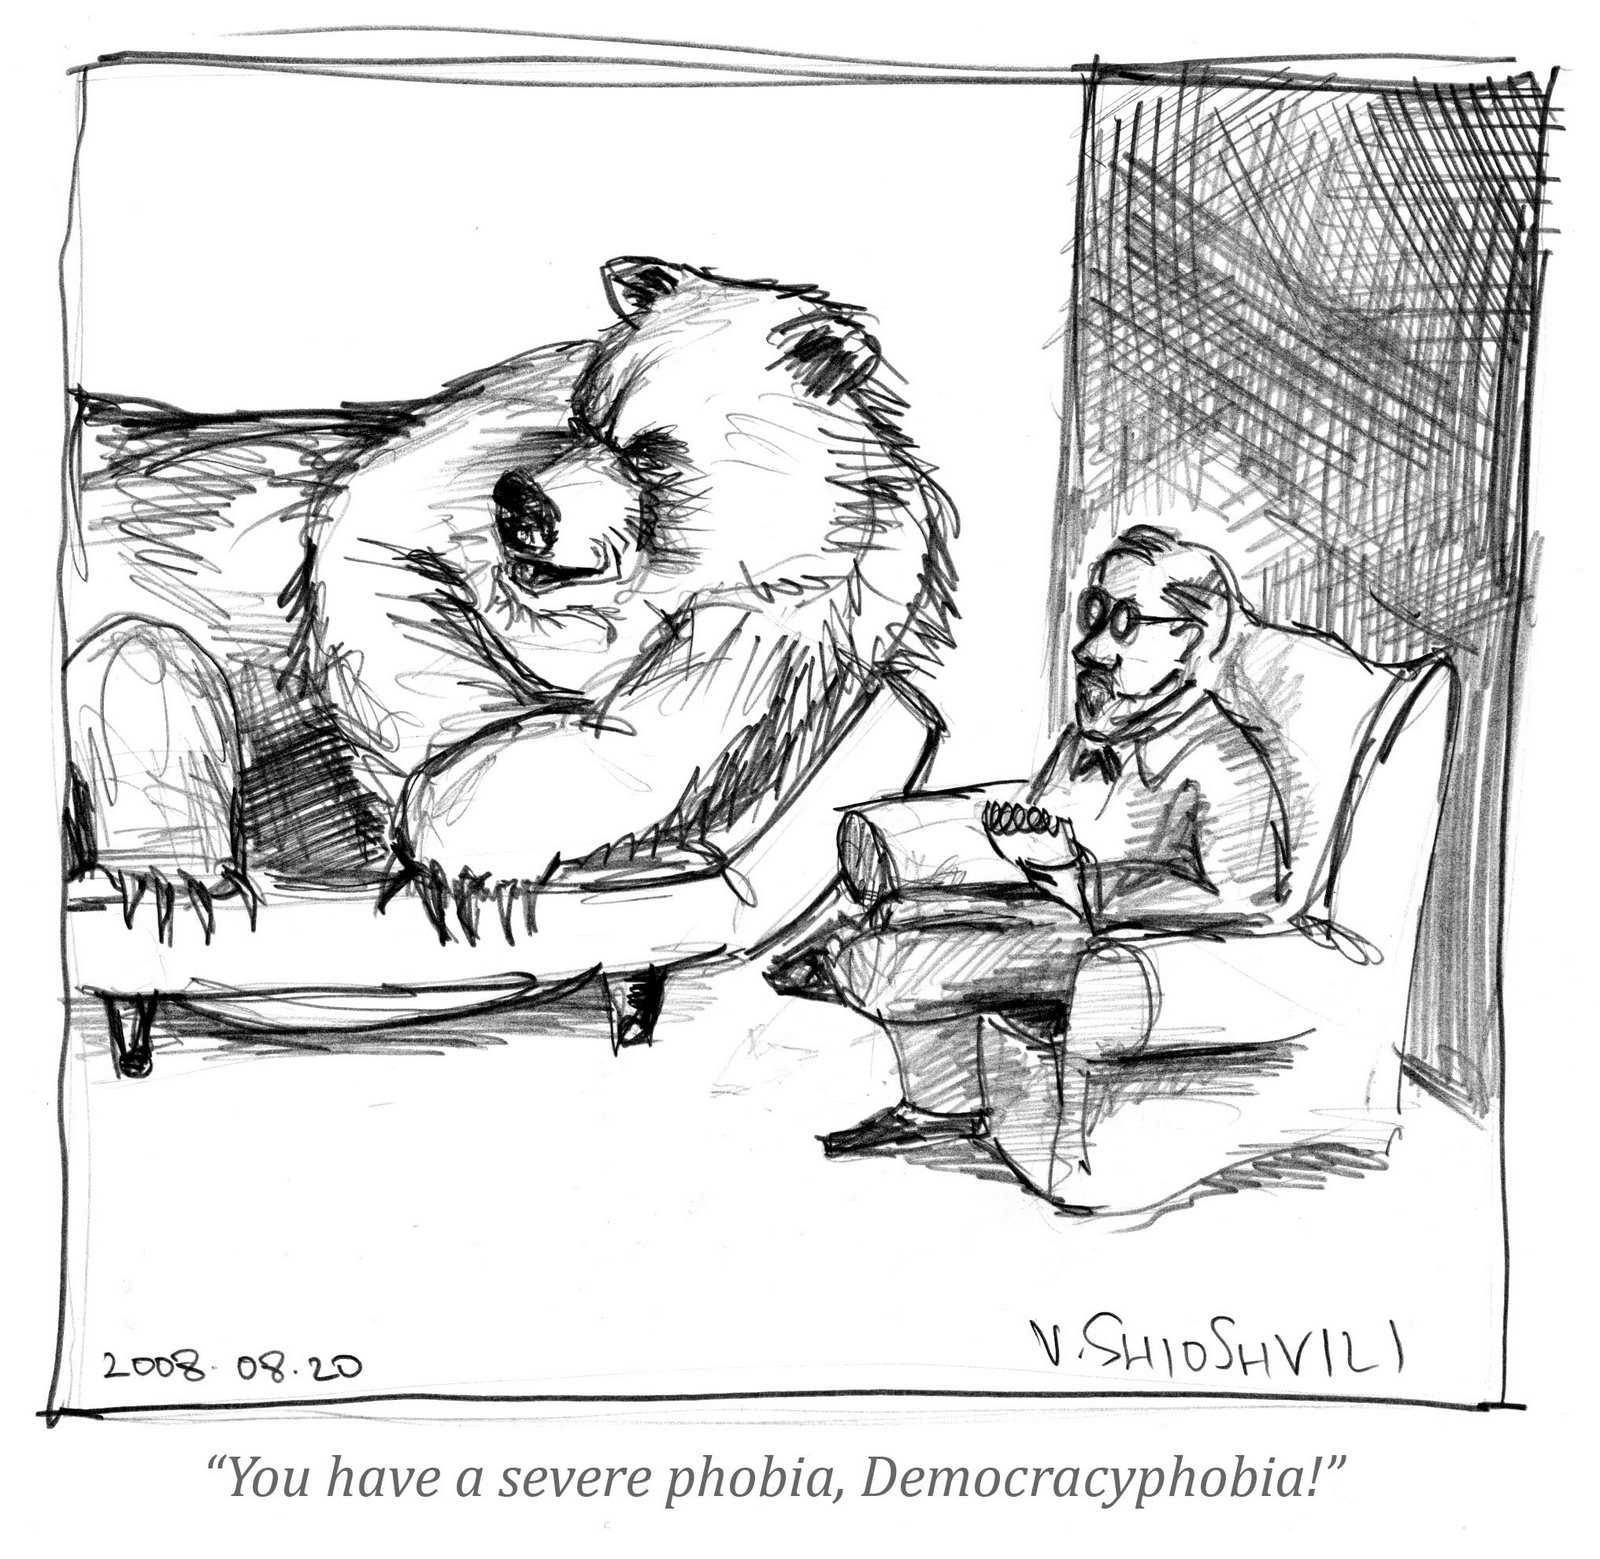 [democracyphobia.jpg]